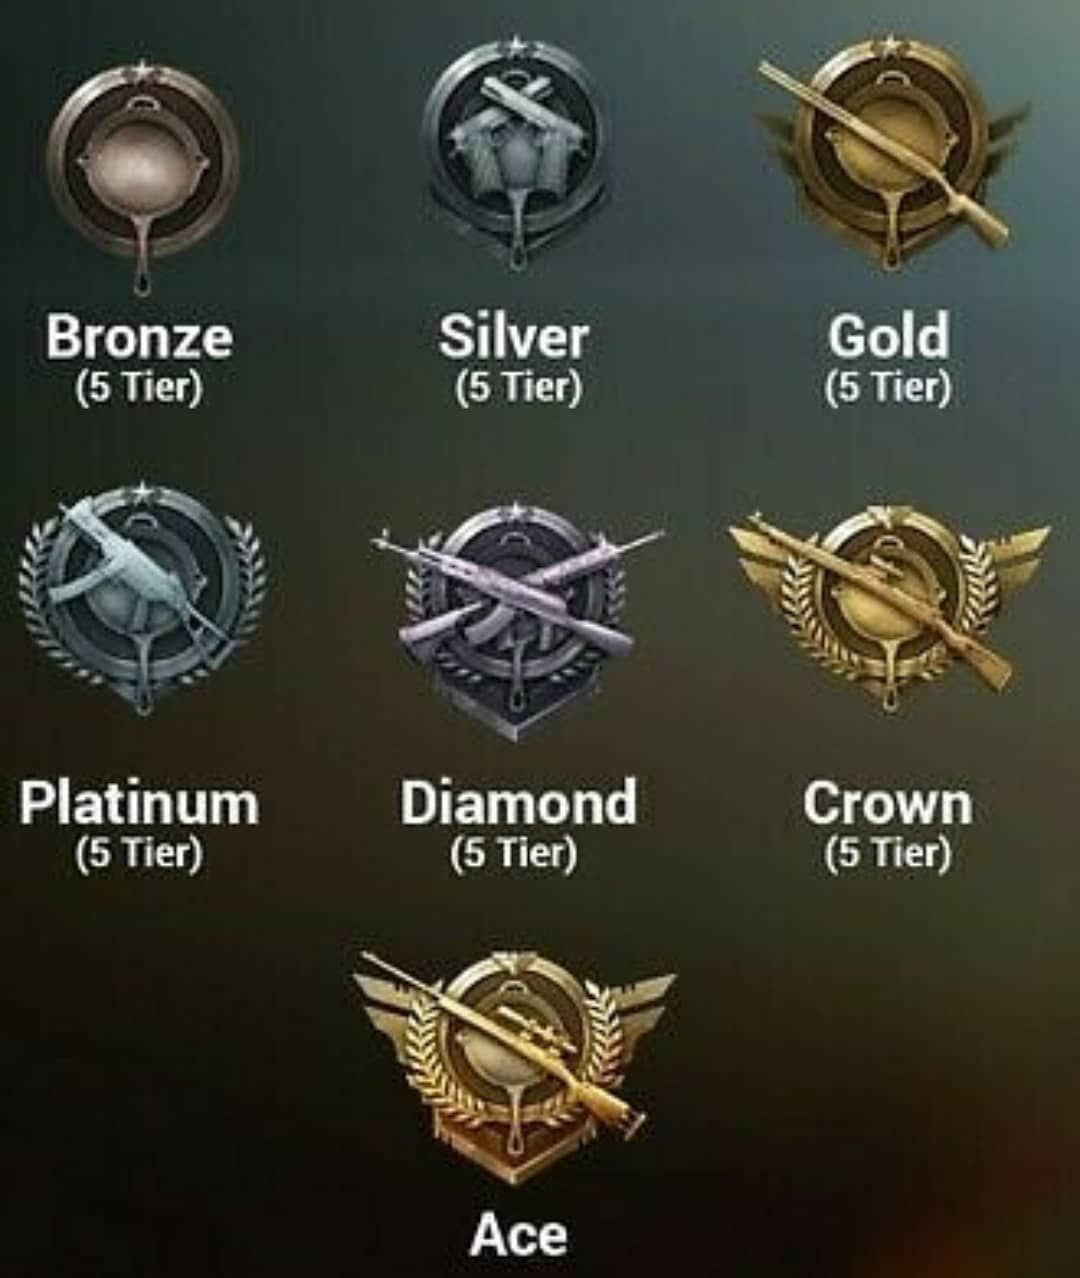 Pin By Vikrant Kshirsagar On Diamond Crown Diamond Crown Bronze Silver